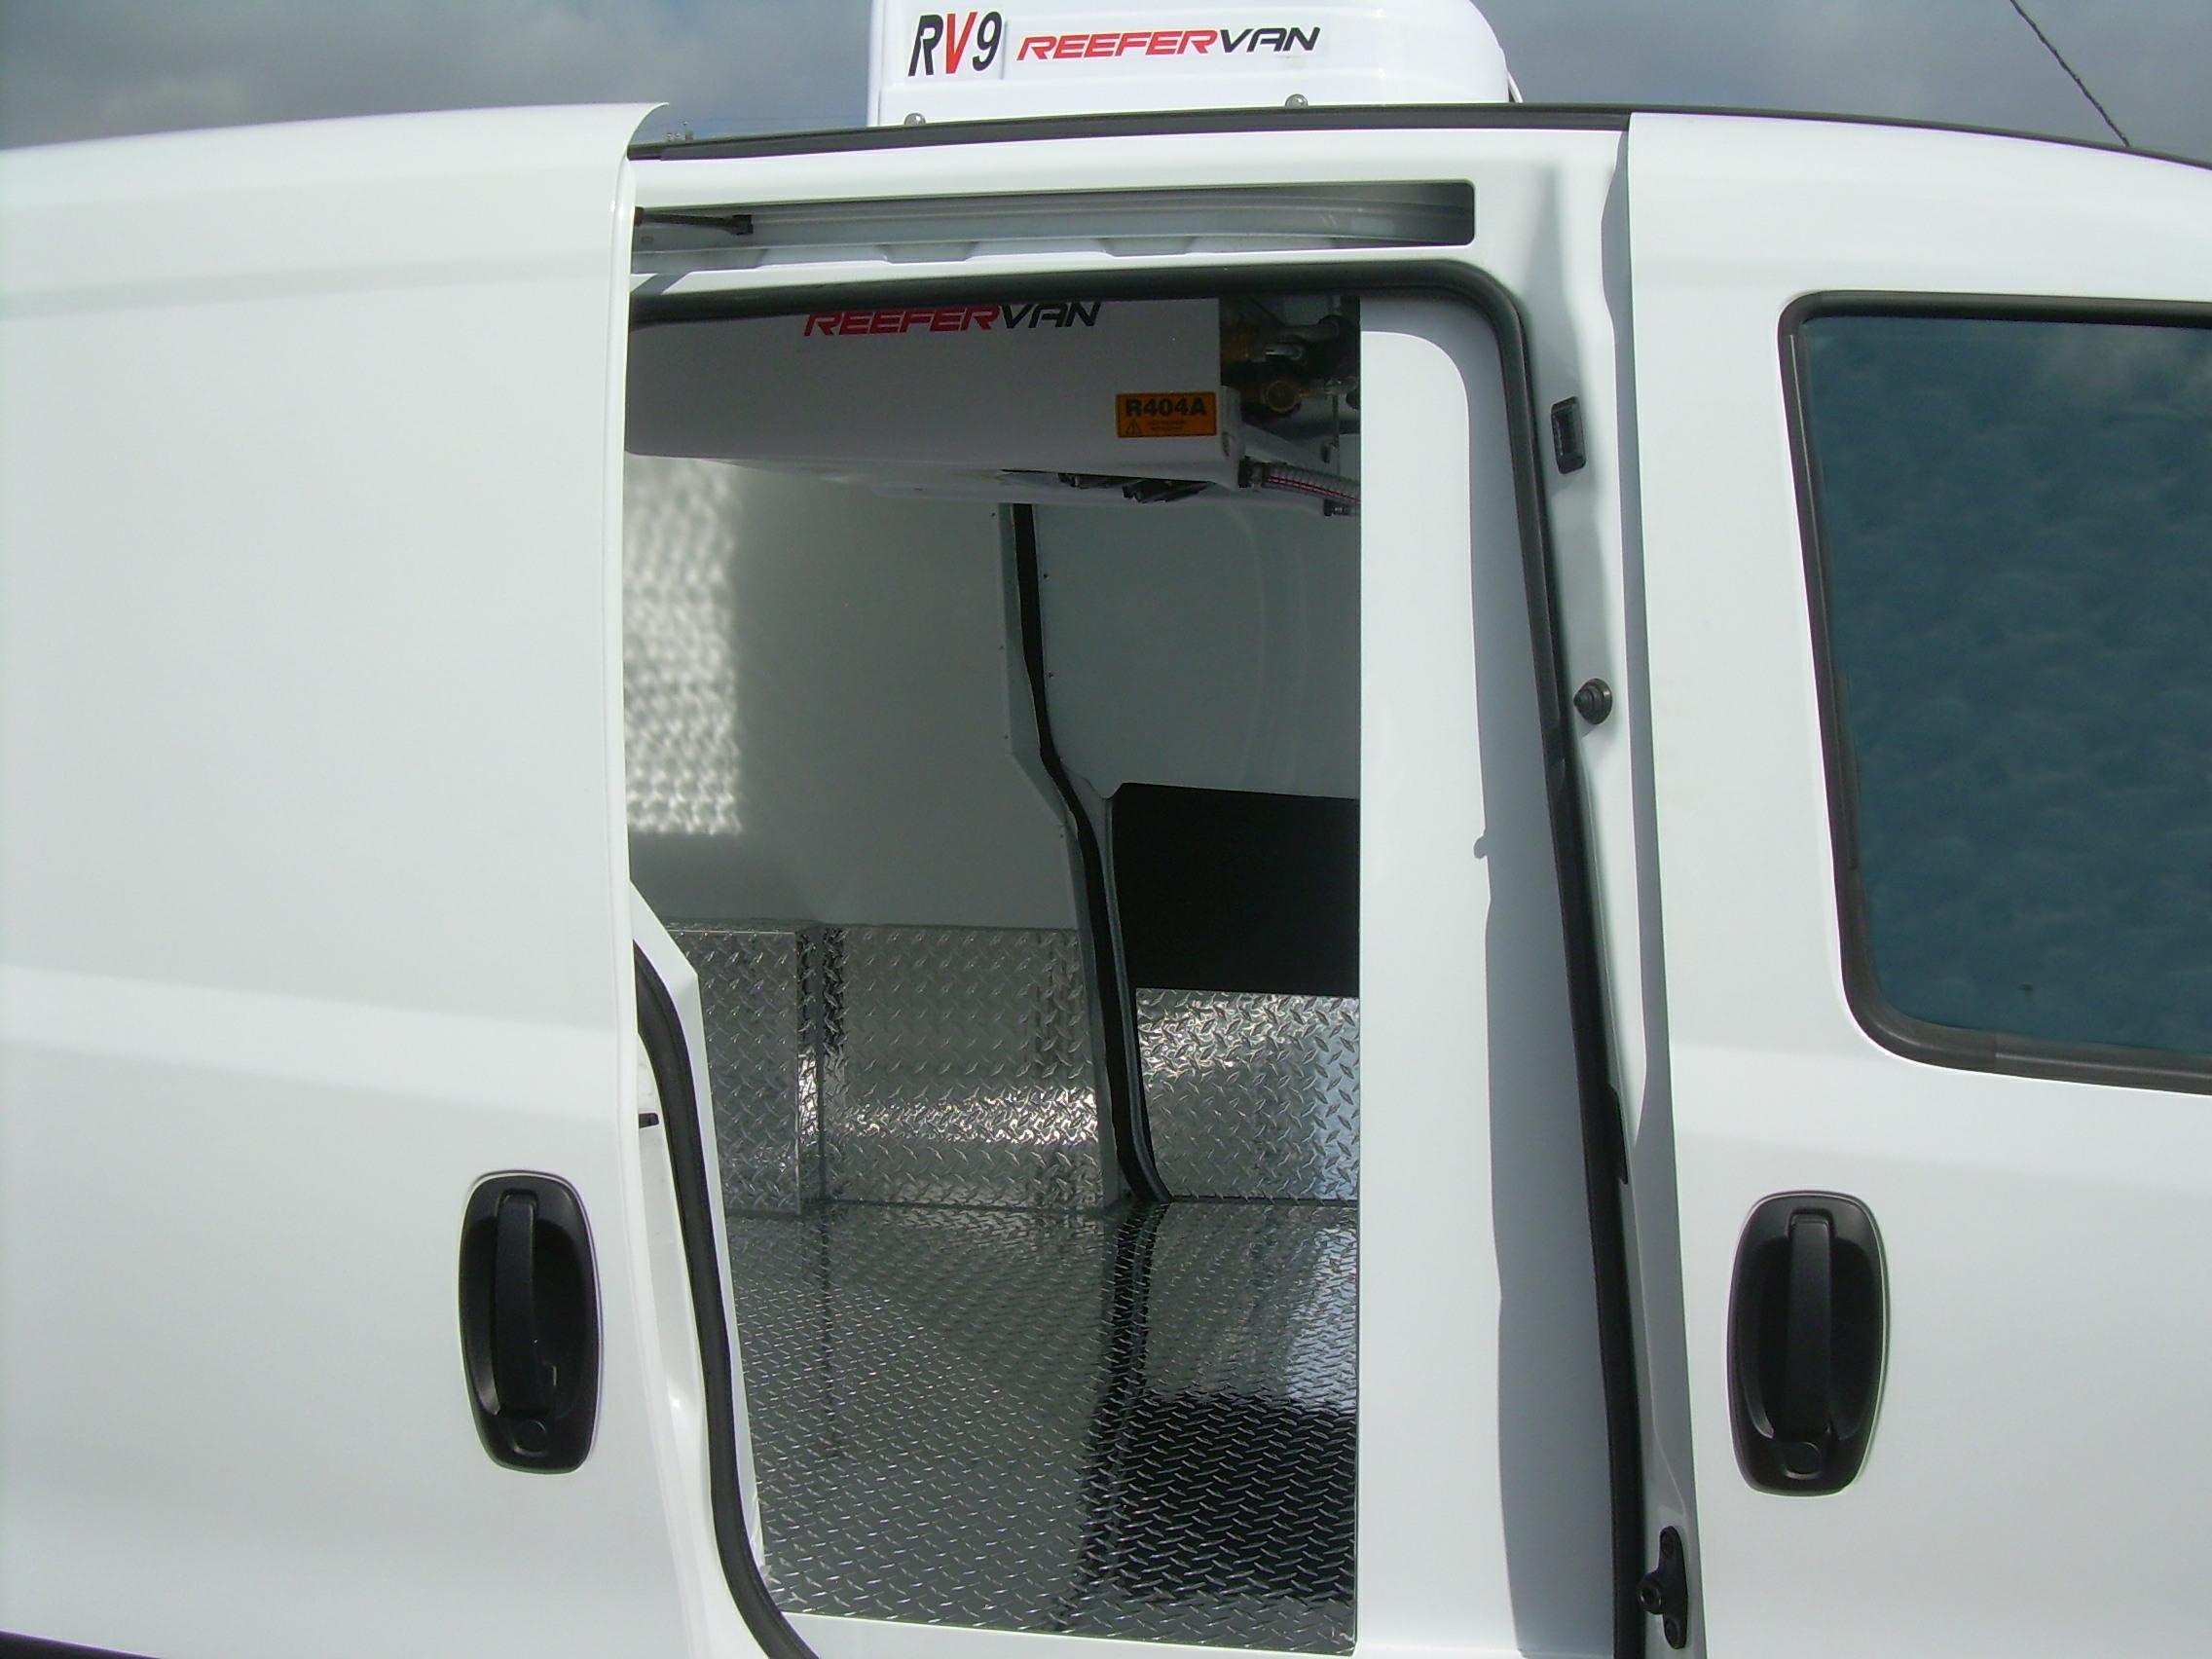 RV9 - Small Van